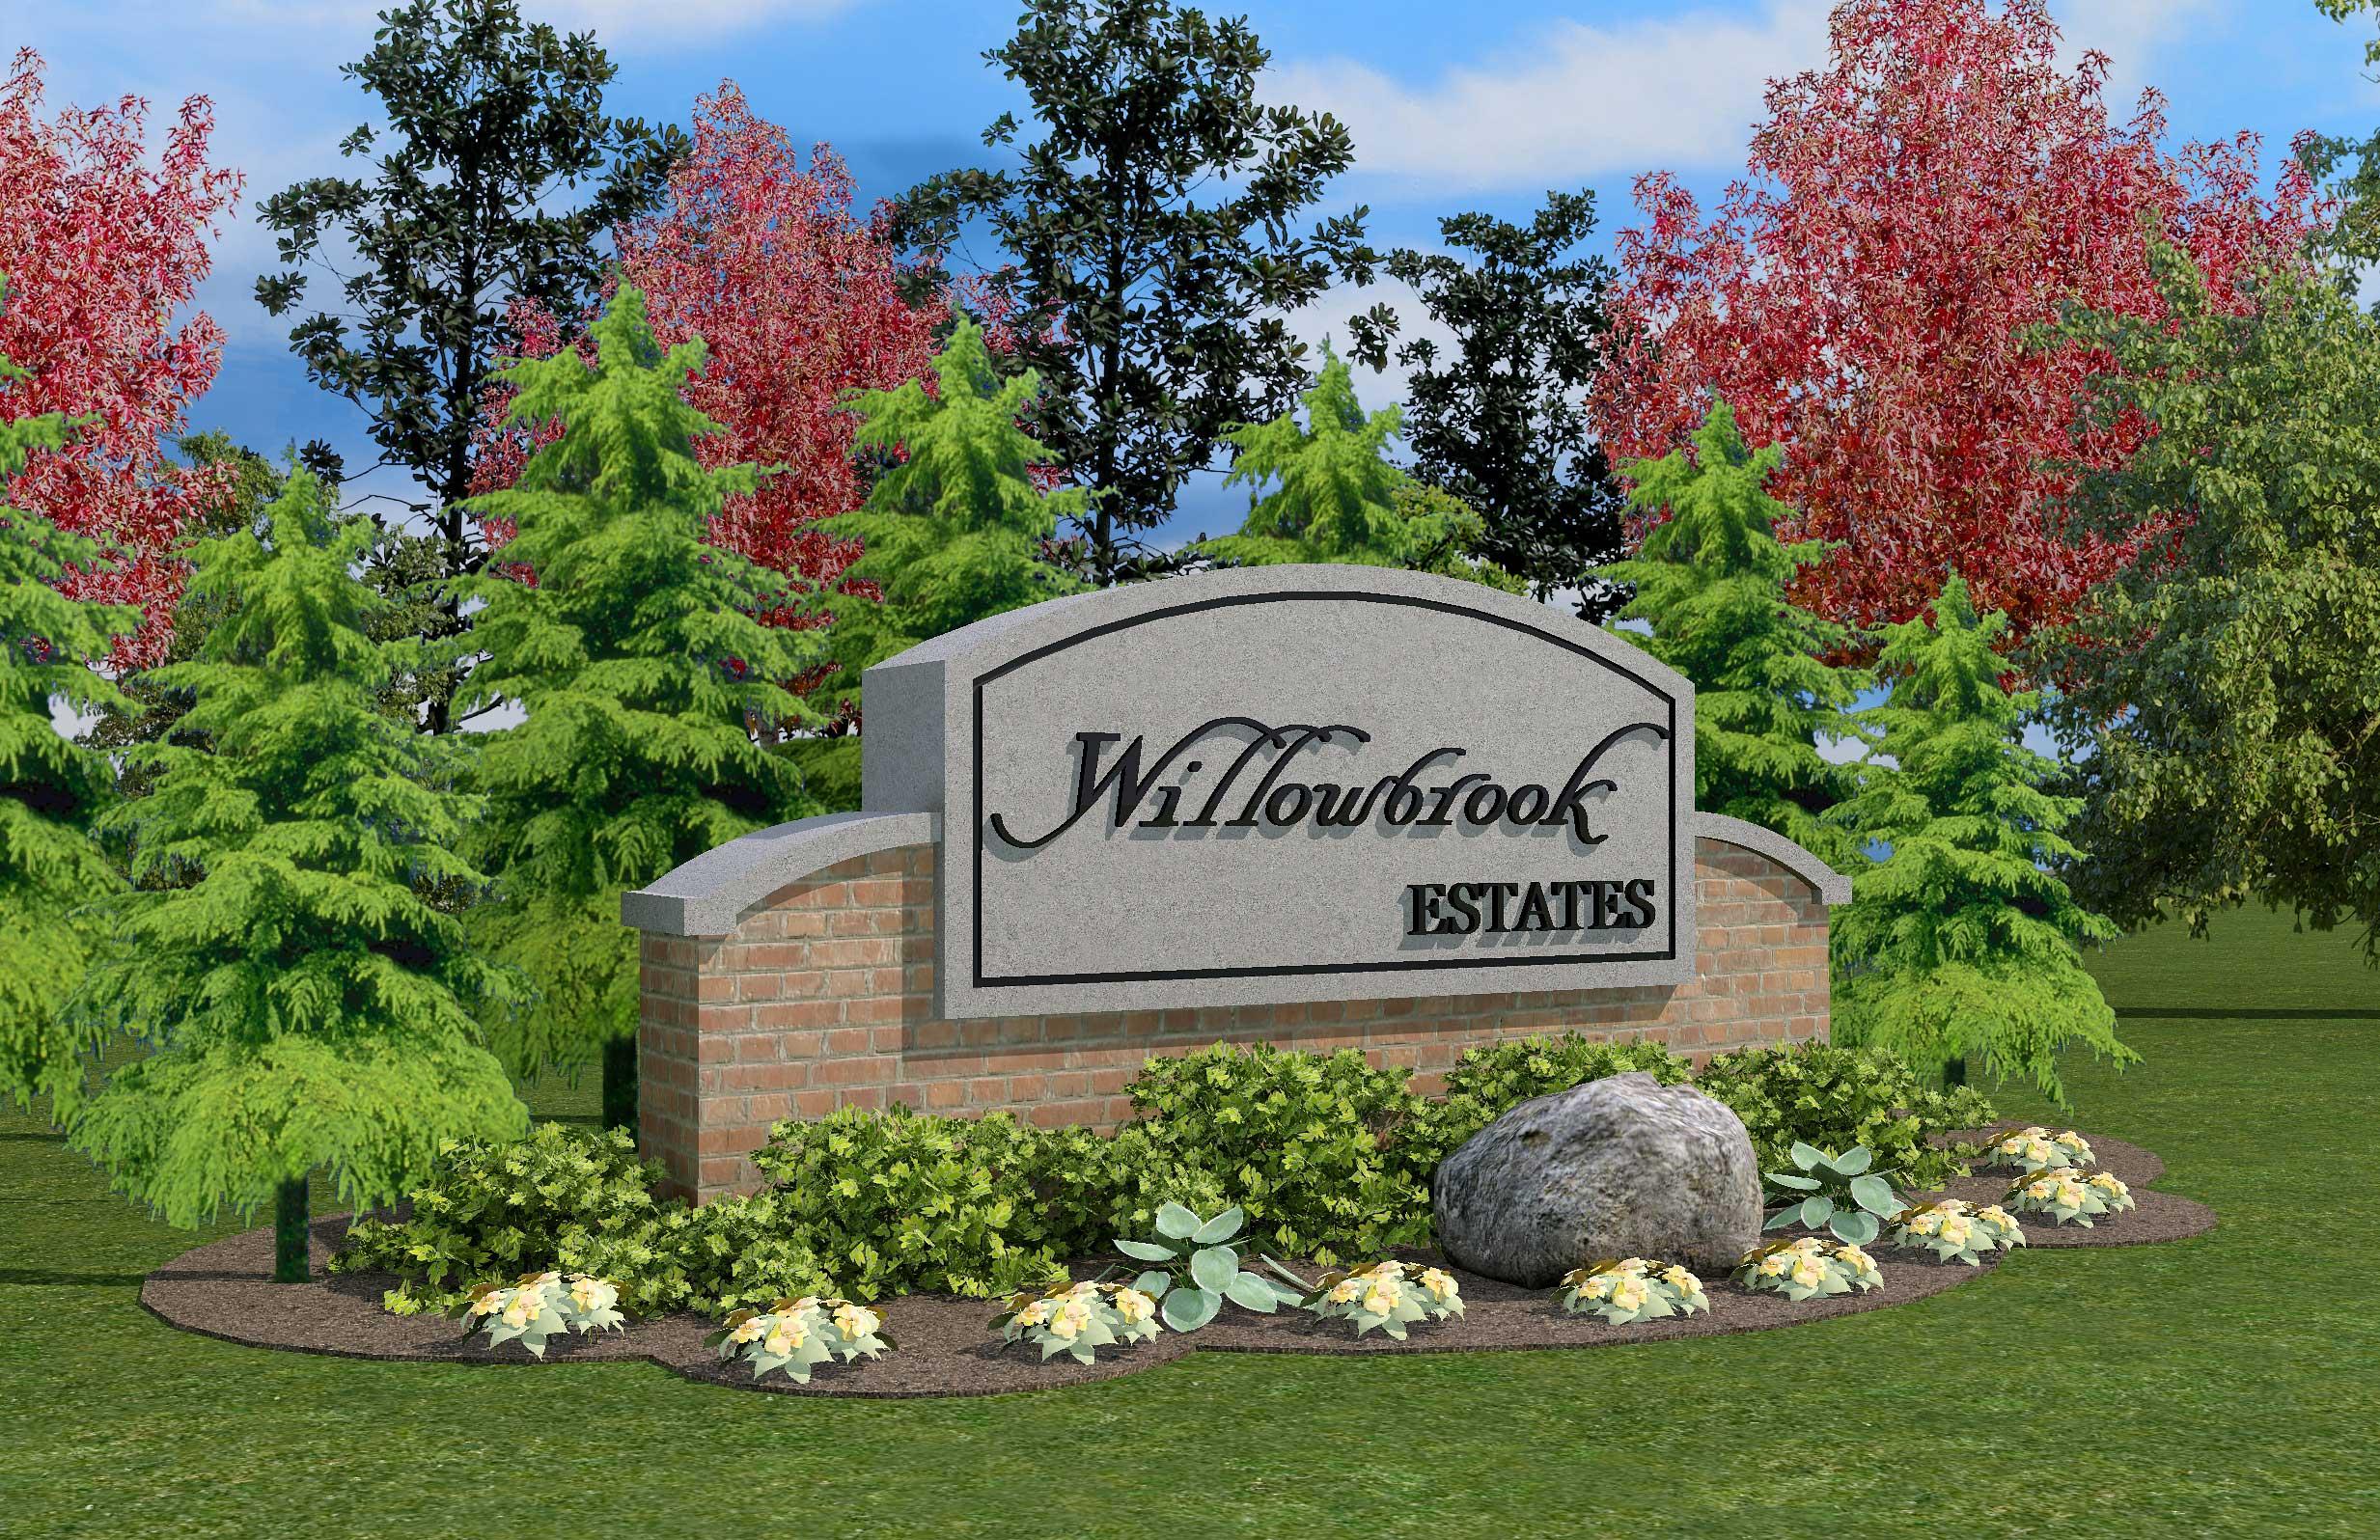 Willowbrook Estates